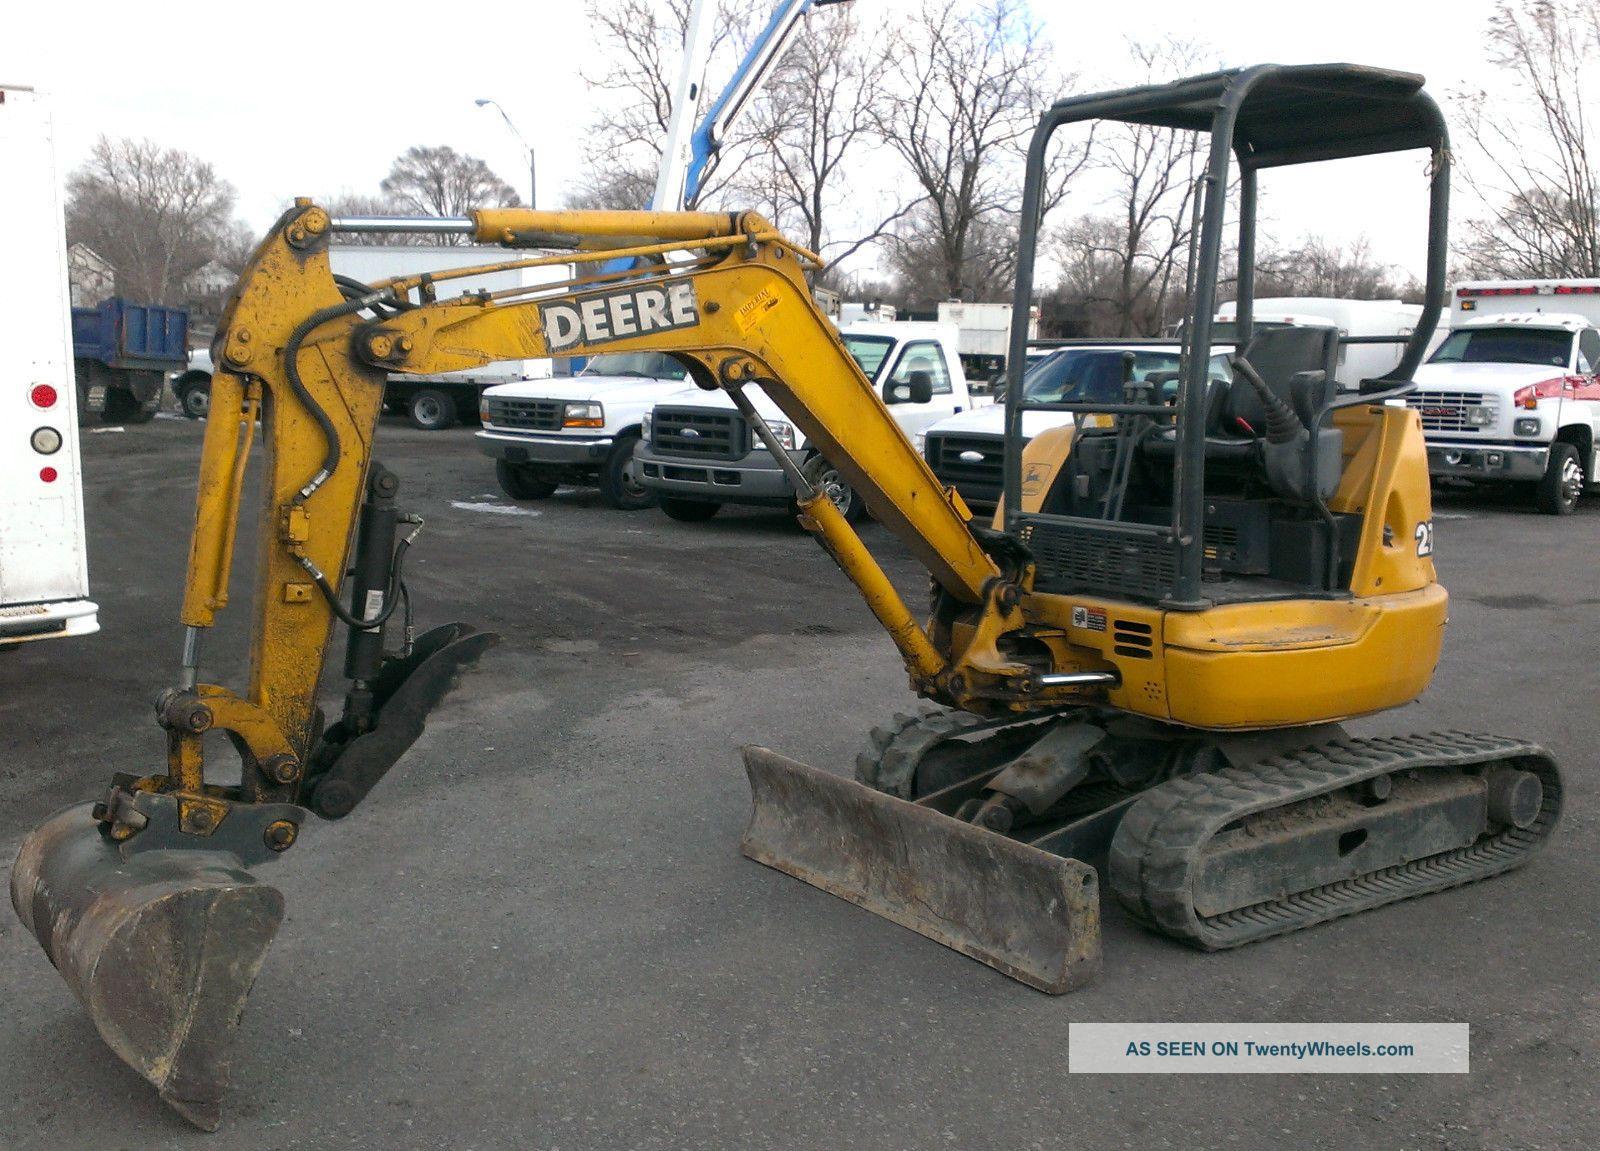 John Deere 27 - Zts Mini Excavator Thumb/clamp 3 Buckets ...